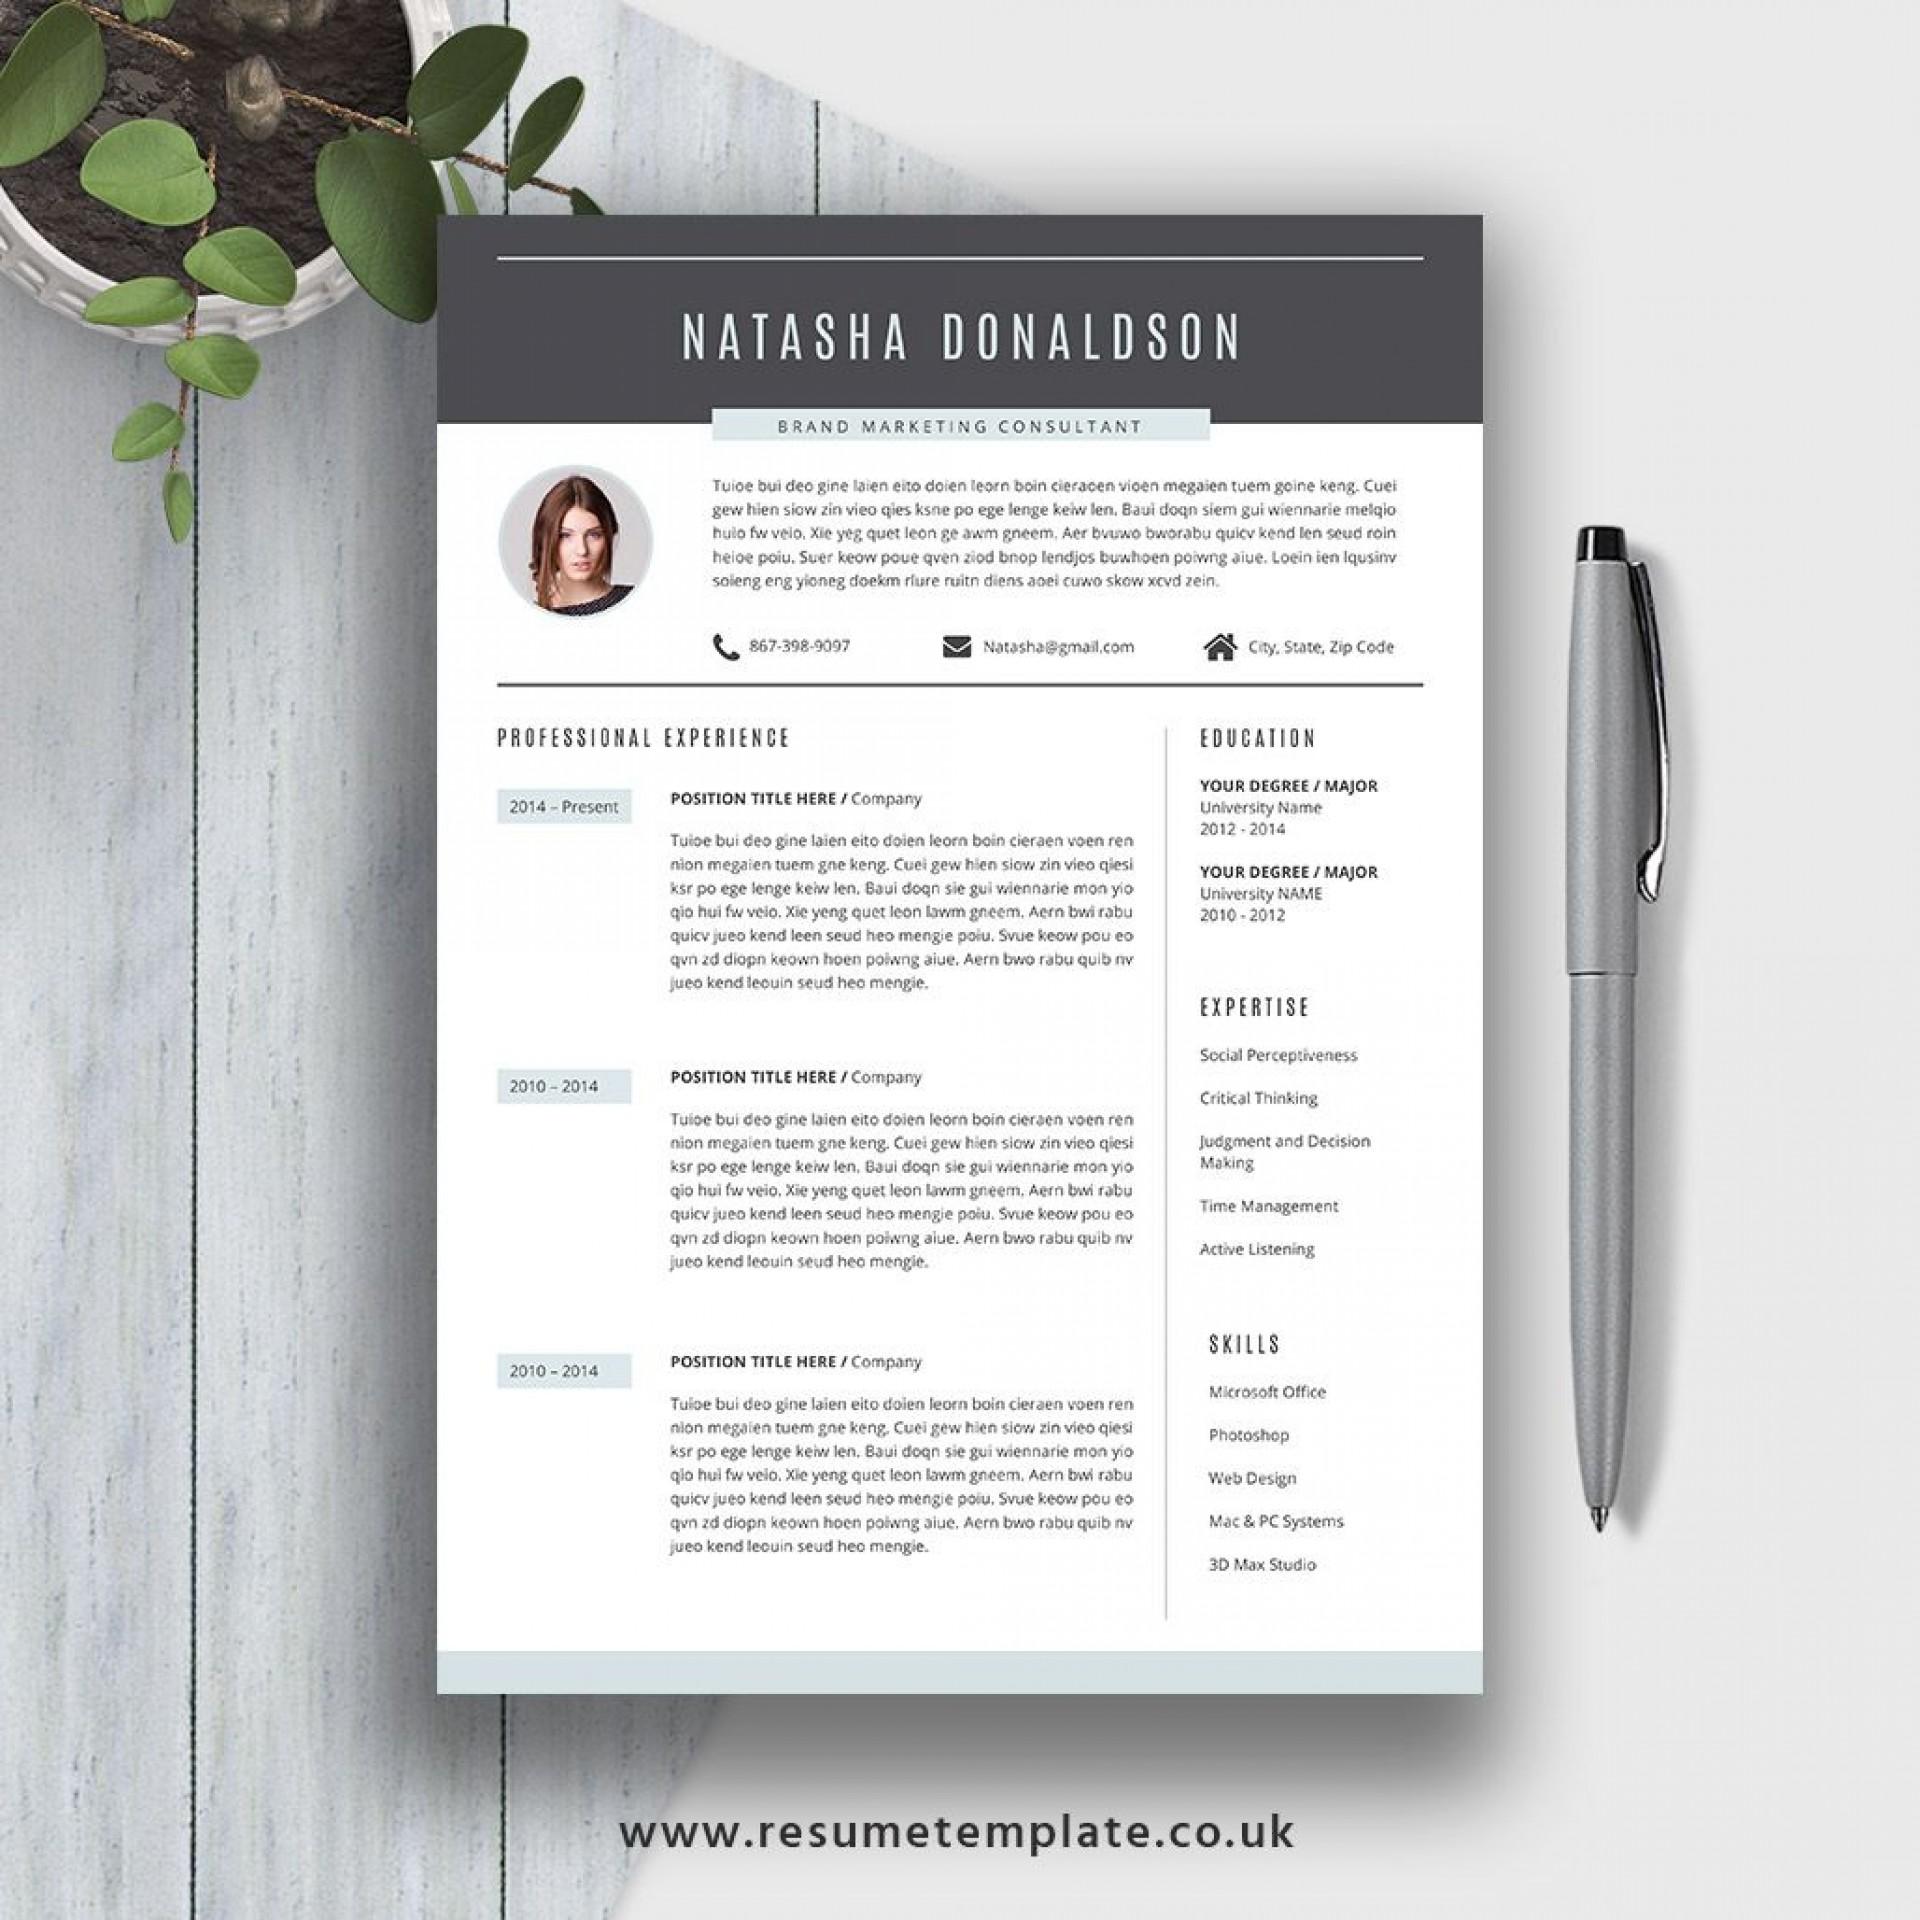 007 Fantastic Resume Template M Word 2020 Photo  Free Microsoft1920